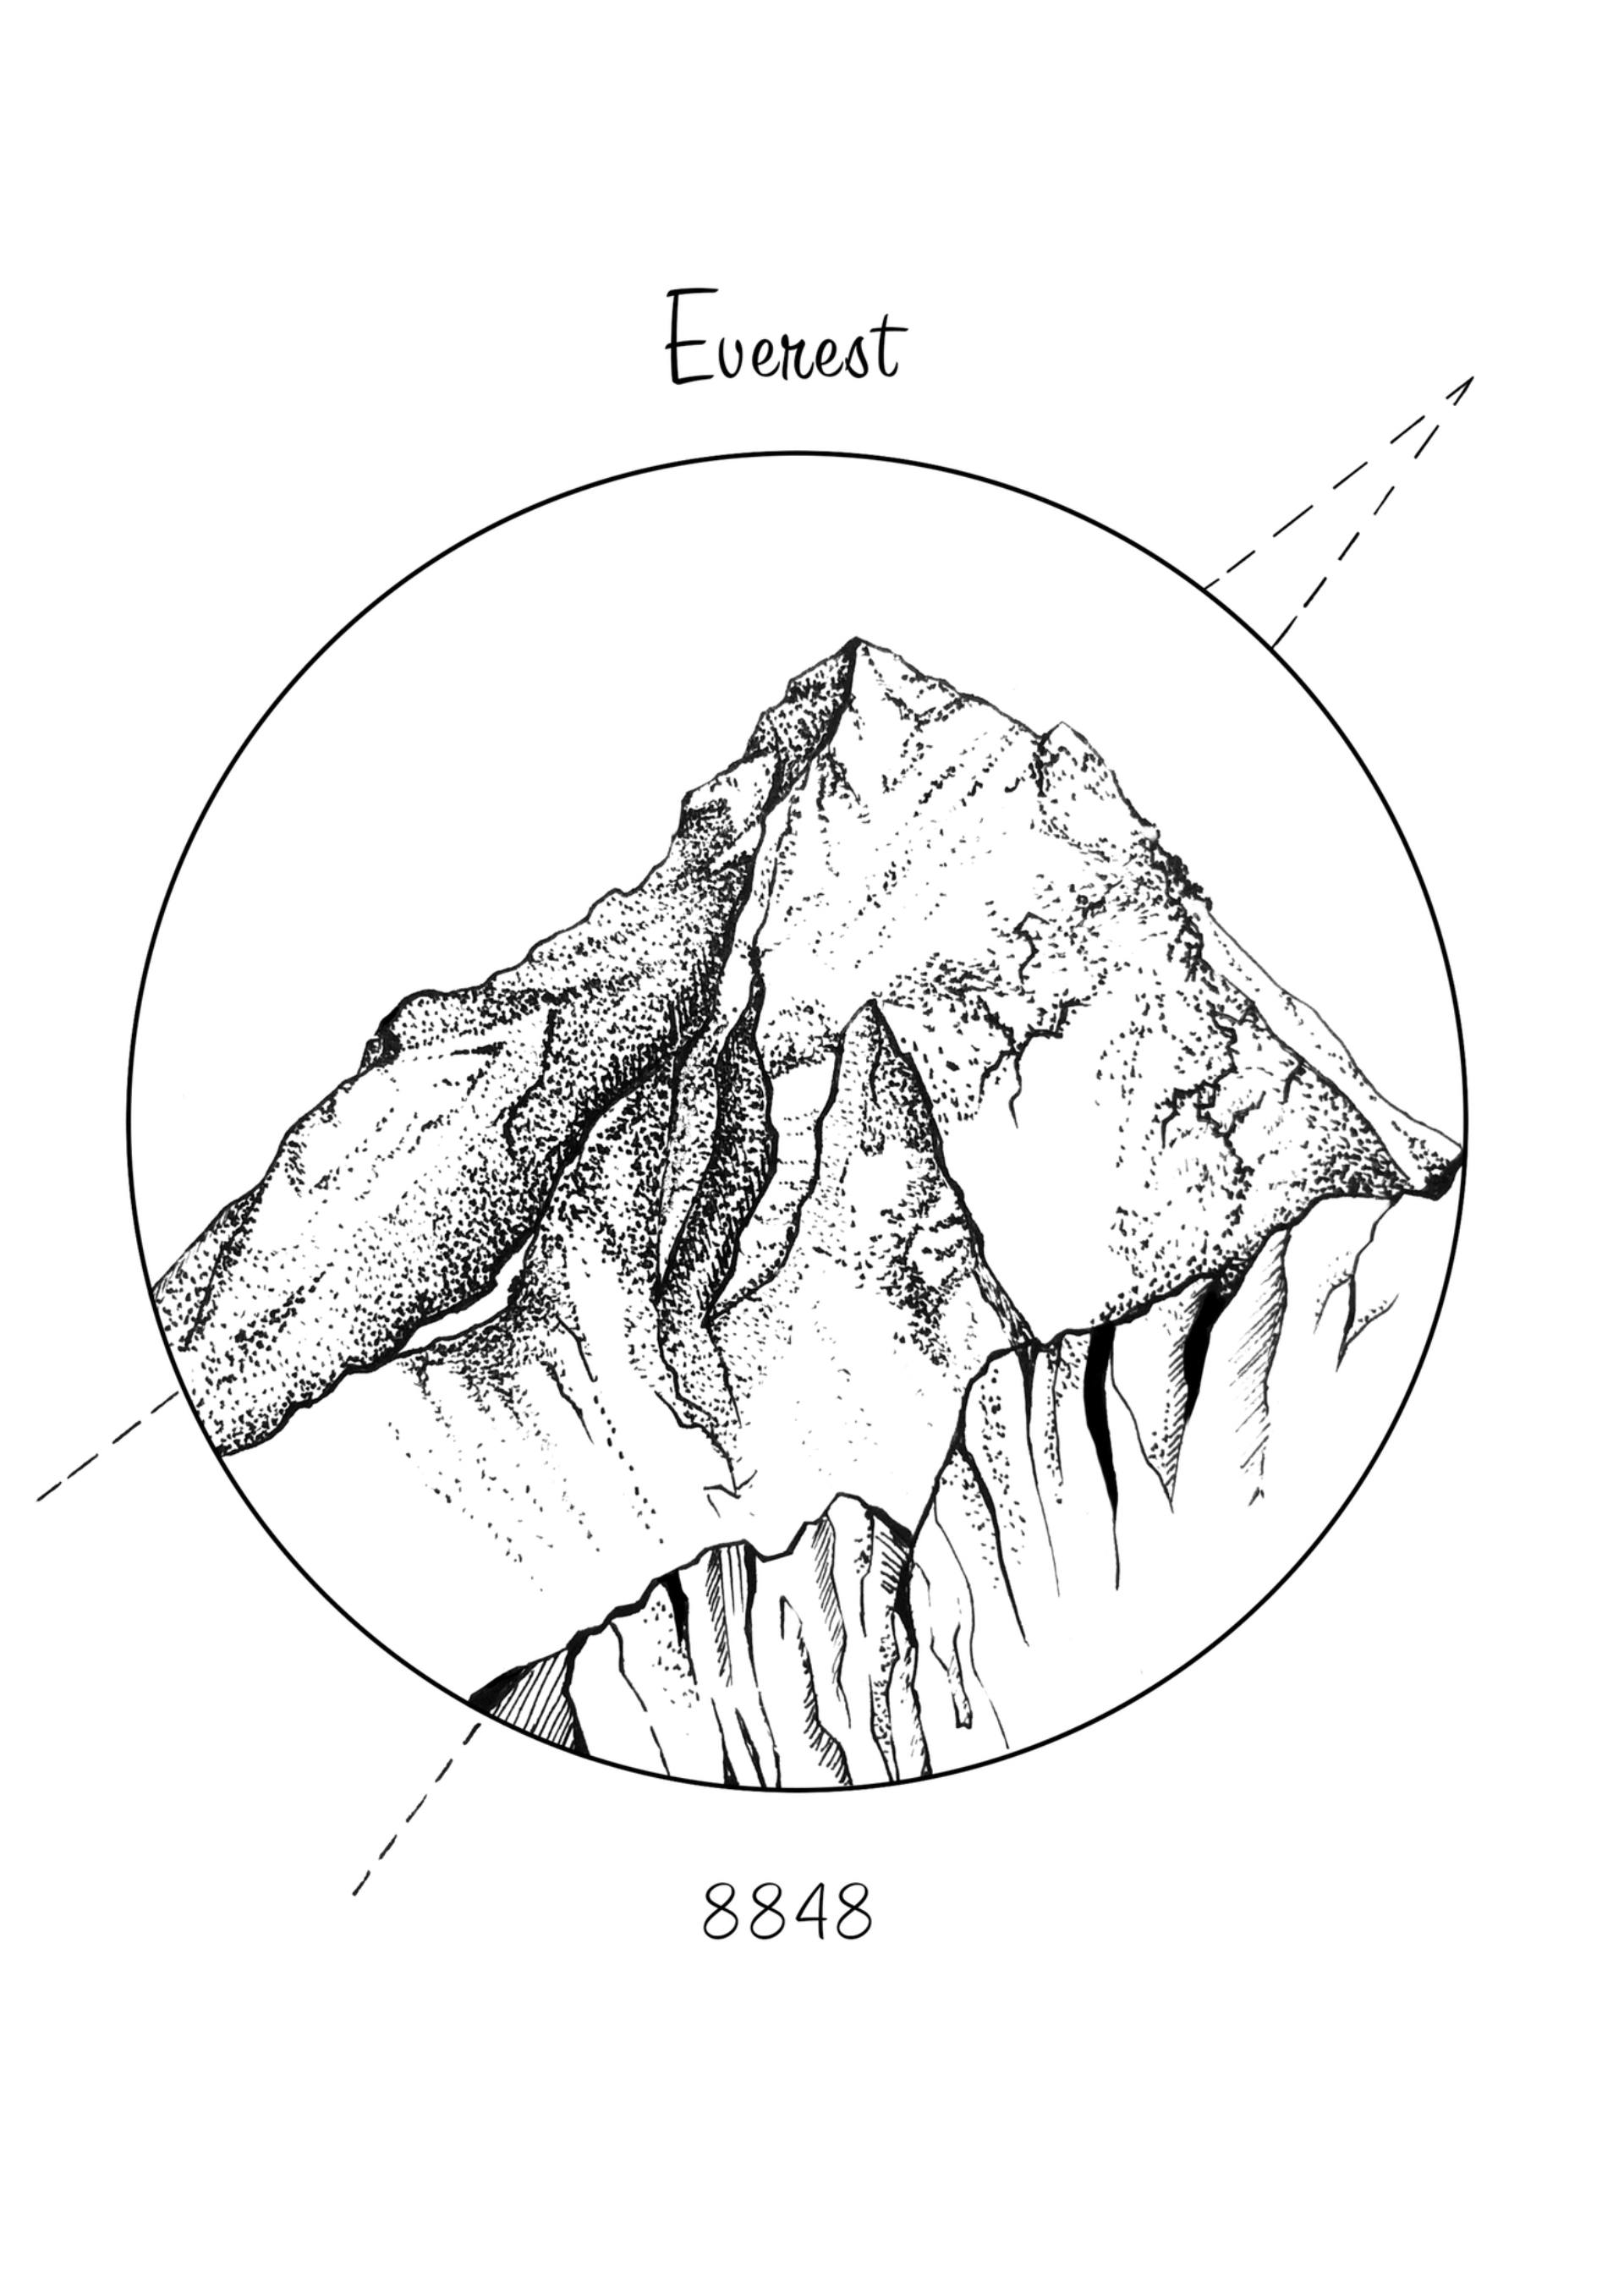 1920x2686 Saatchi Art Everest Drawing By Olga Druzhinina